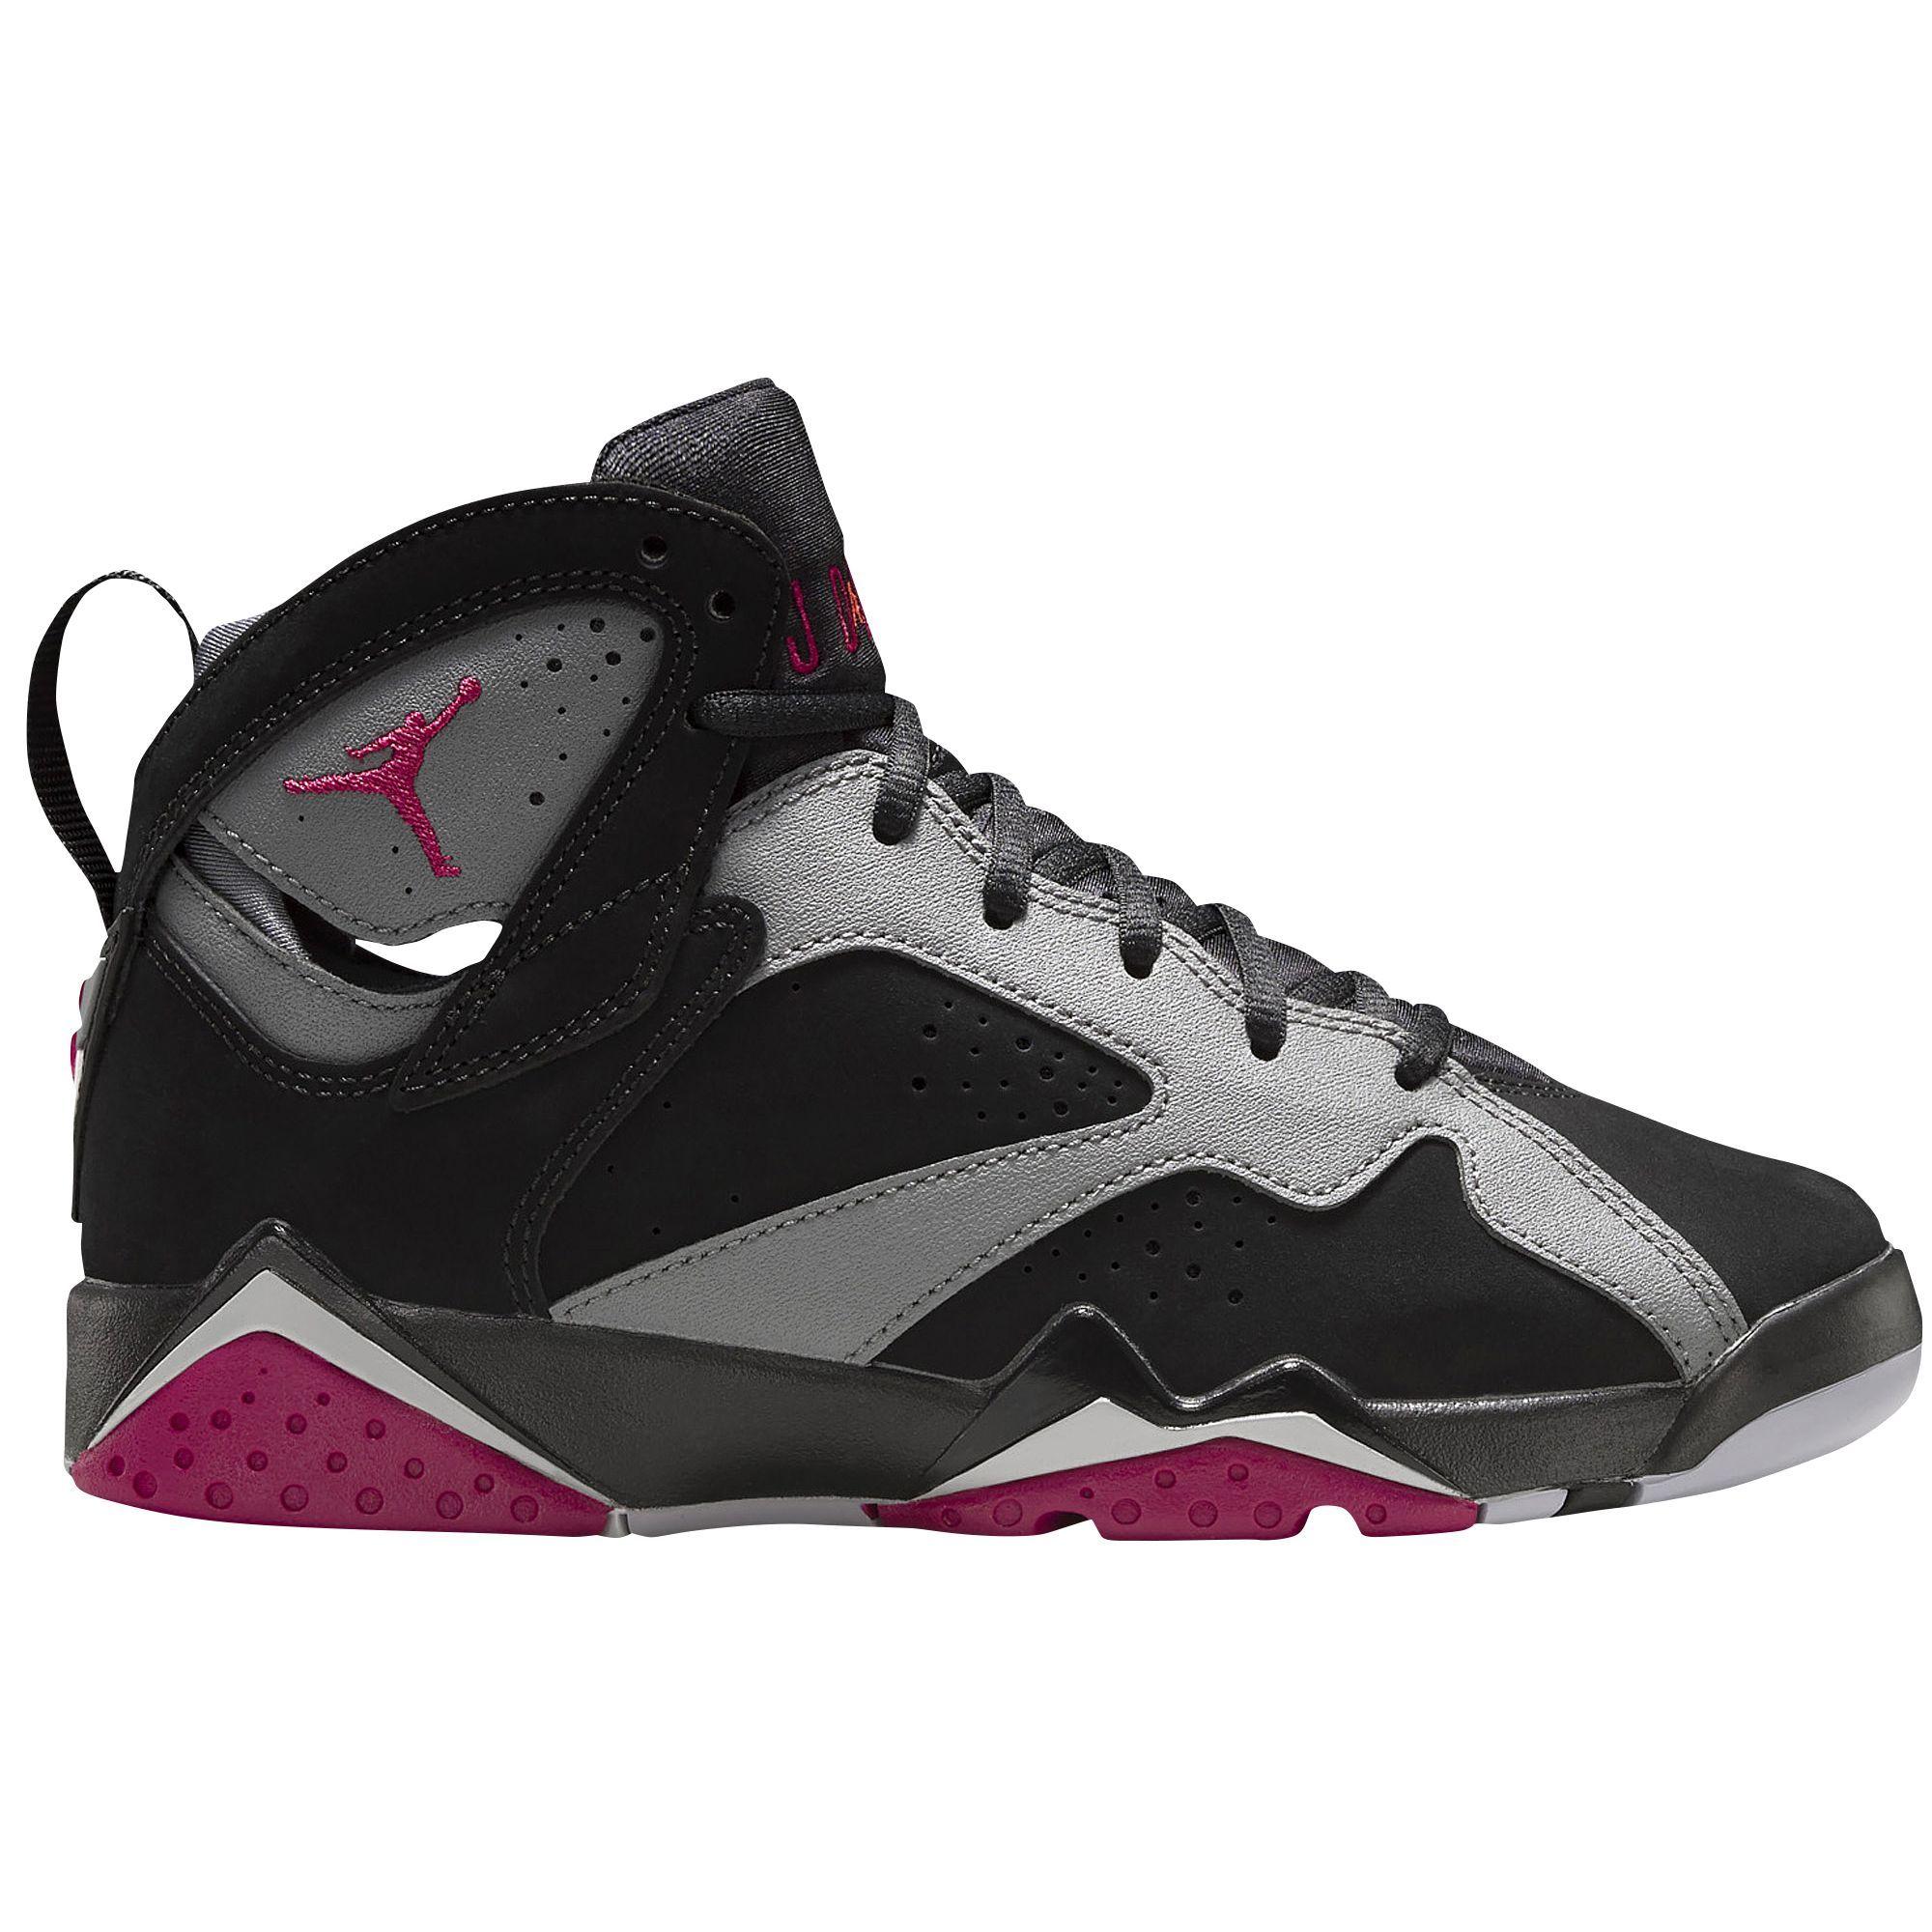 100% authentic 50abd 14f75 ... Jordan Retro 7 - Girls Grade School - Shoes  Grade School Youth Size Nike  Air ...